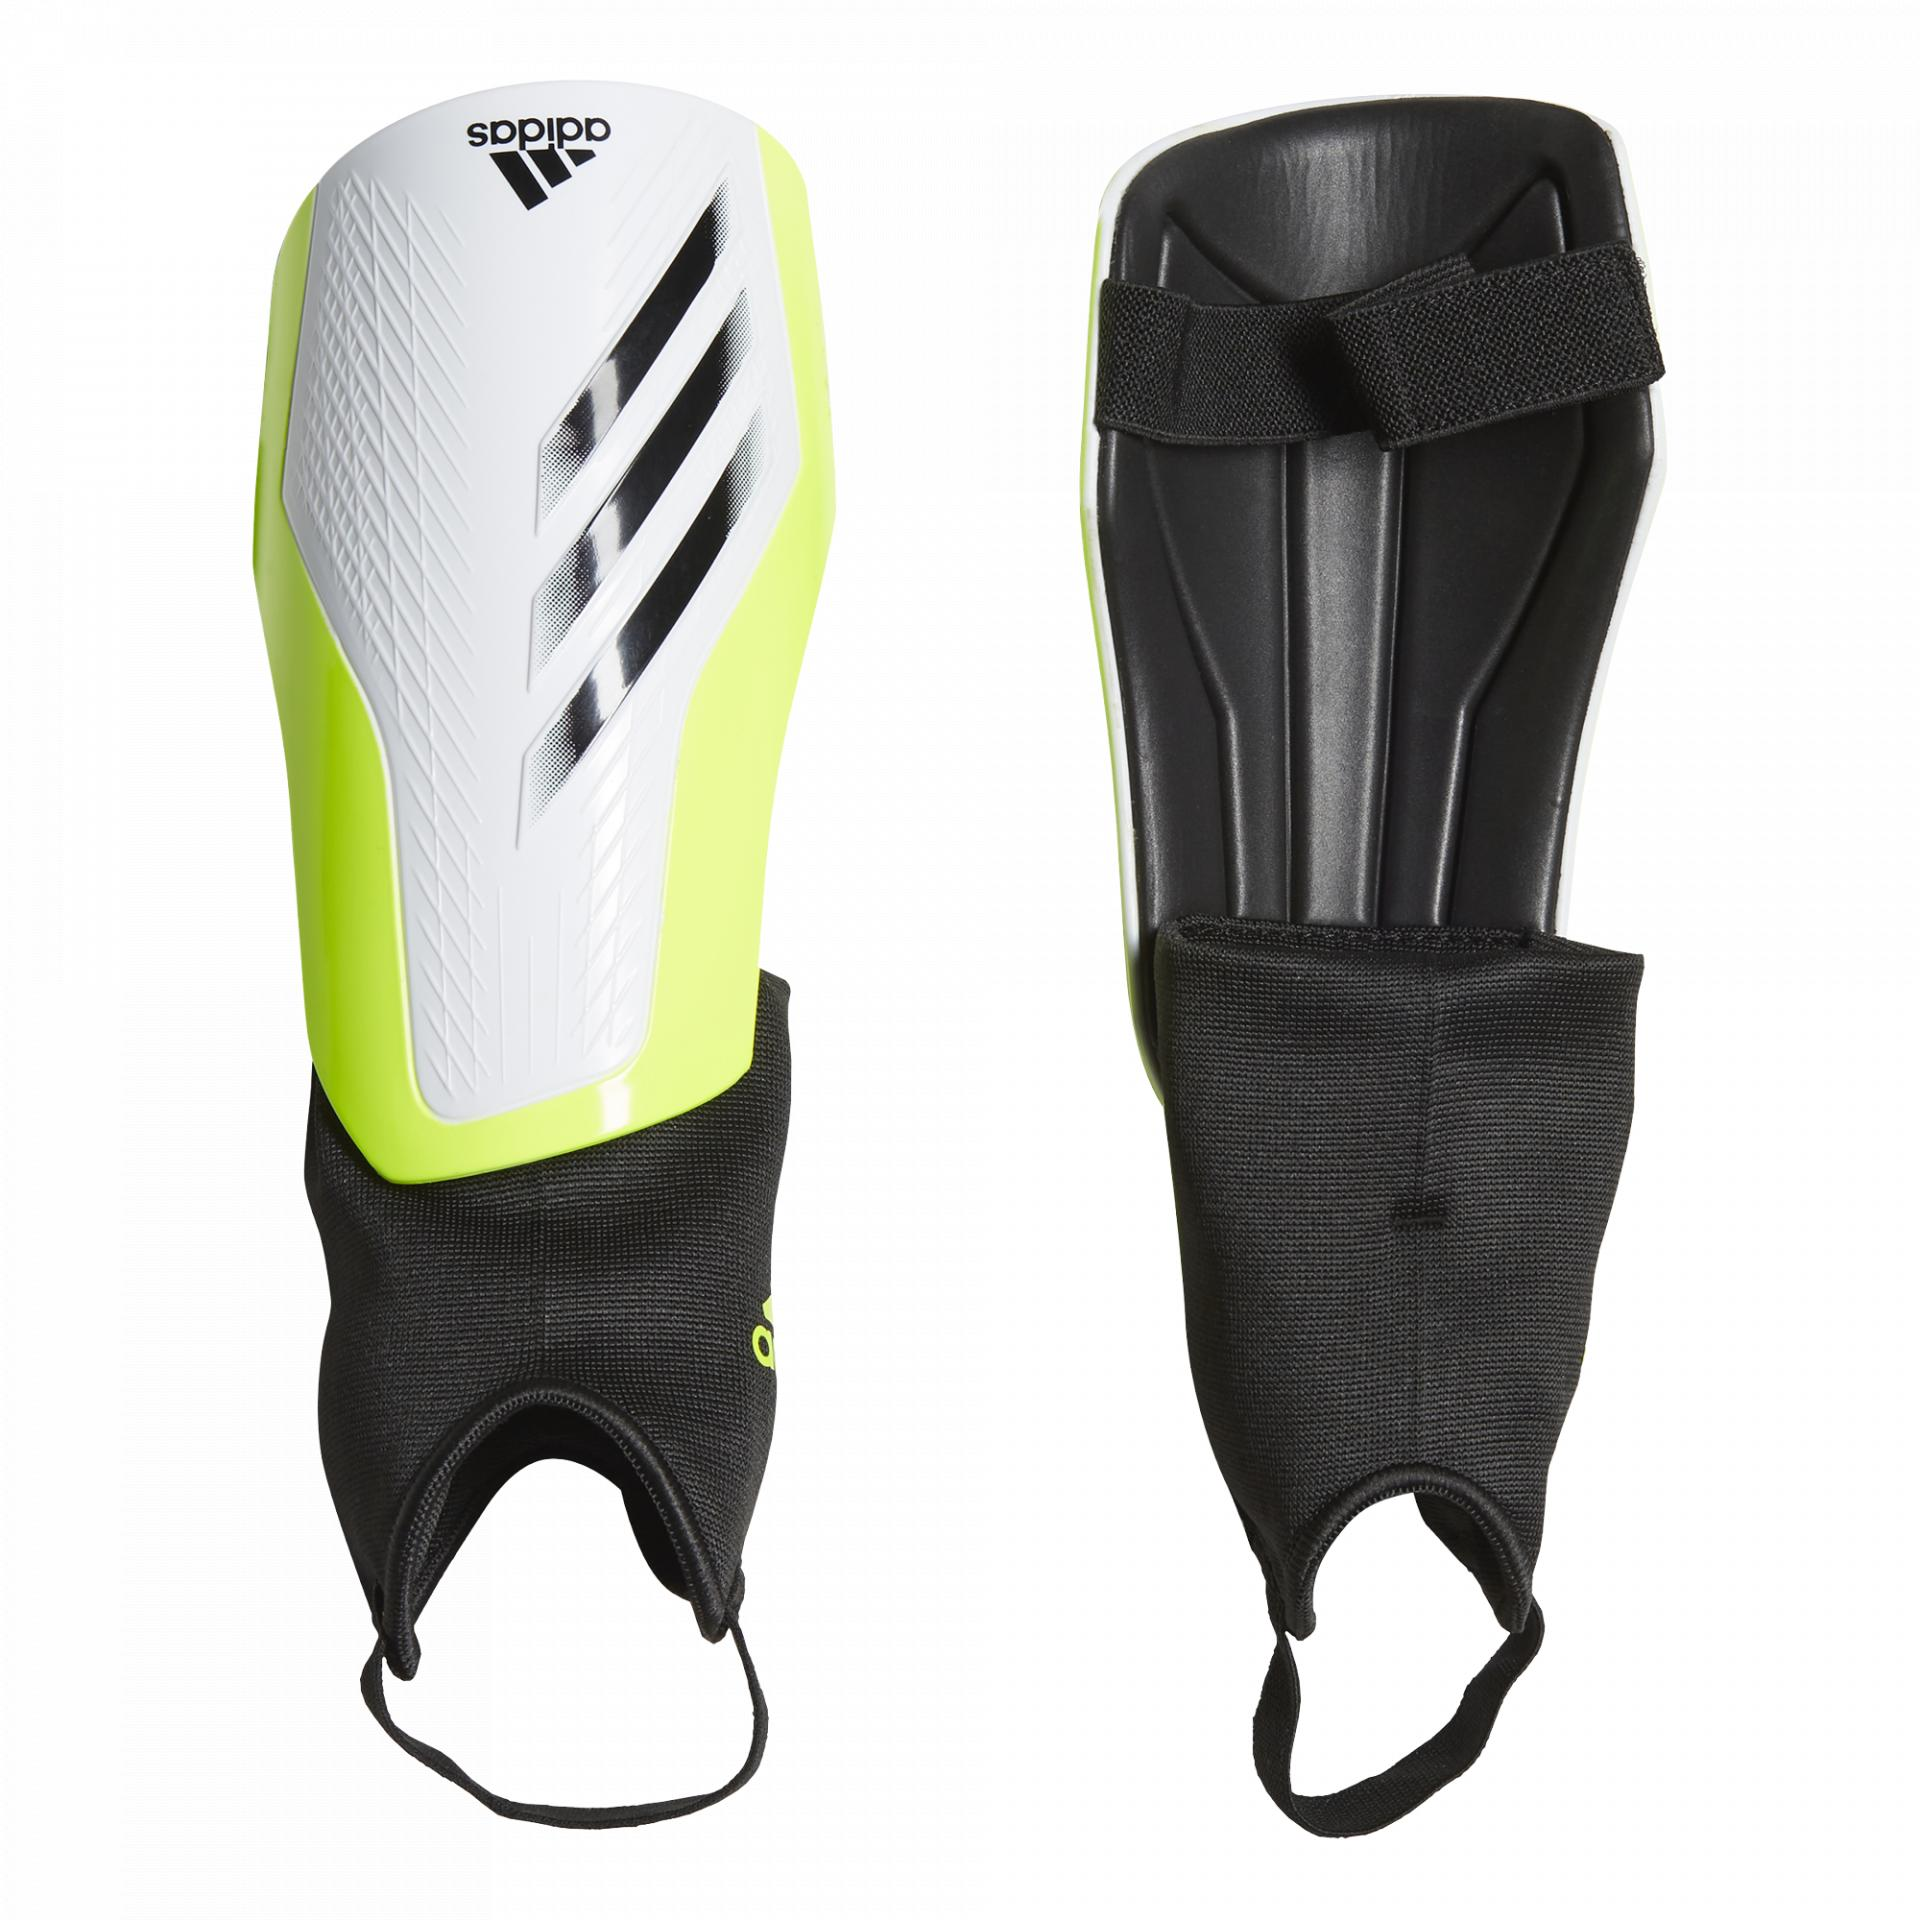 Espinillera Adidas X SG MTC GK3526